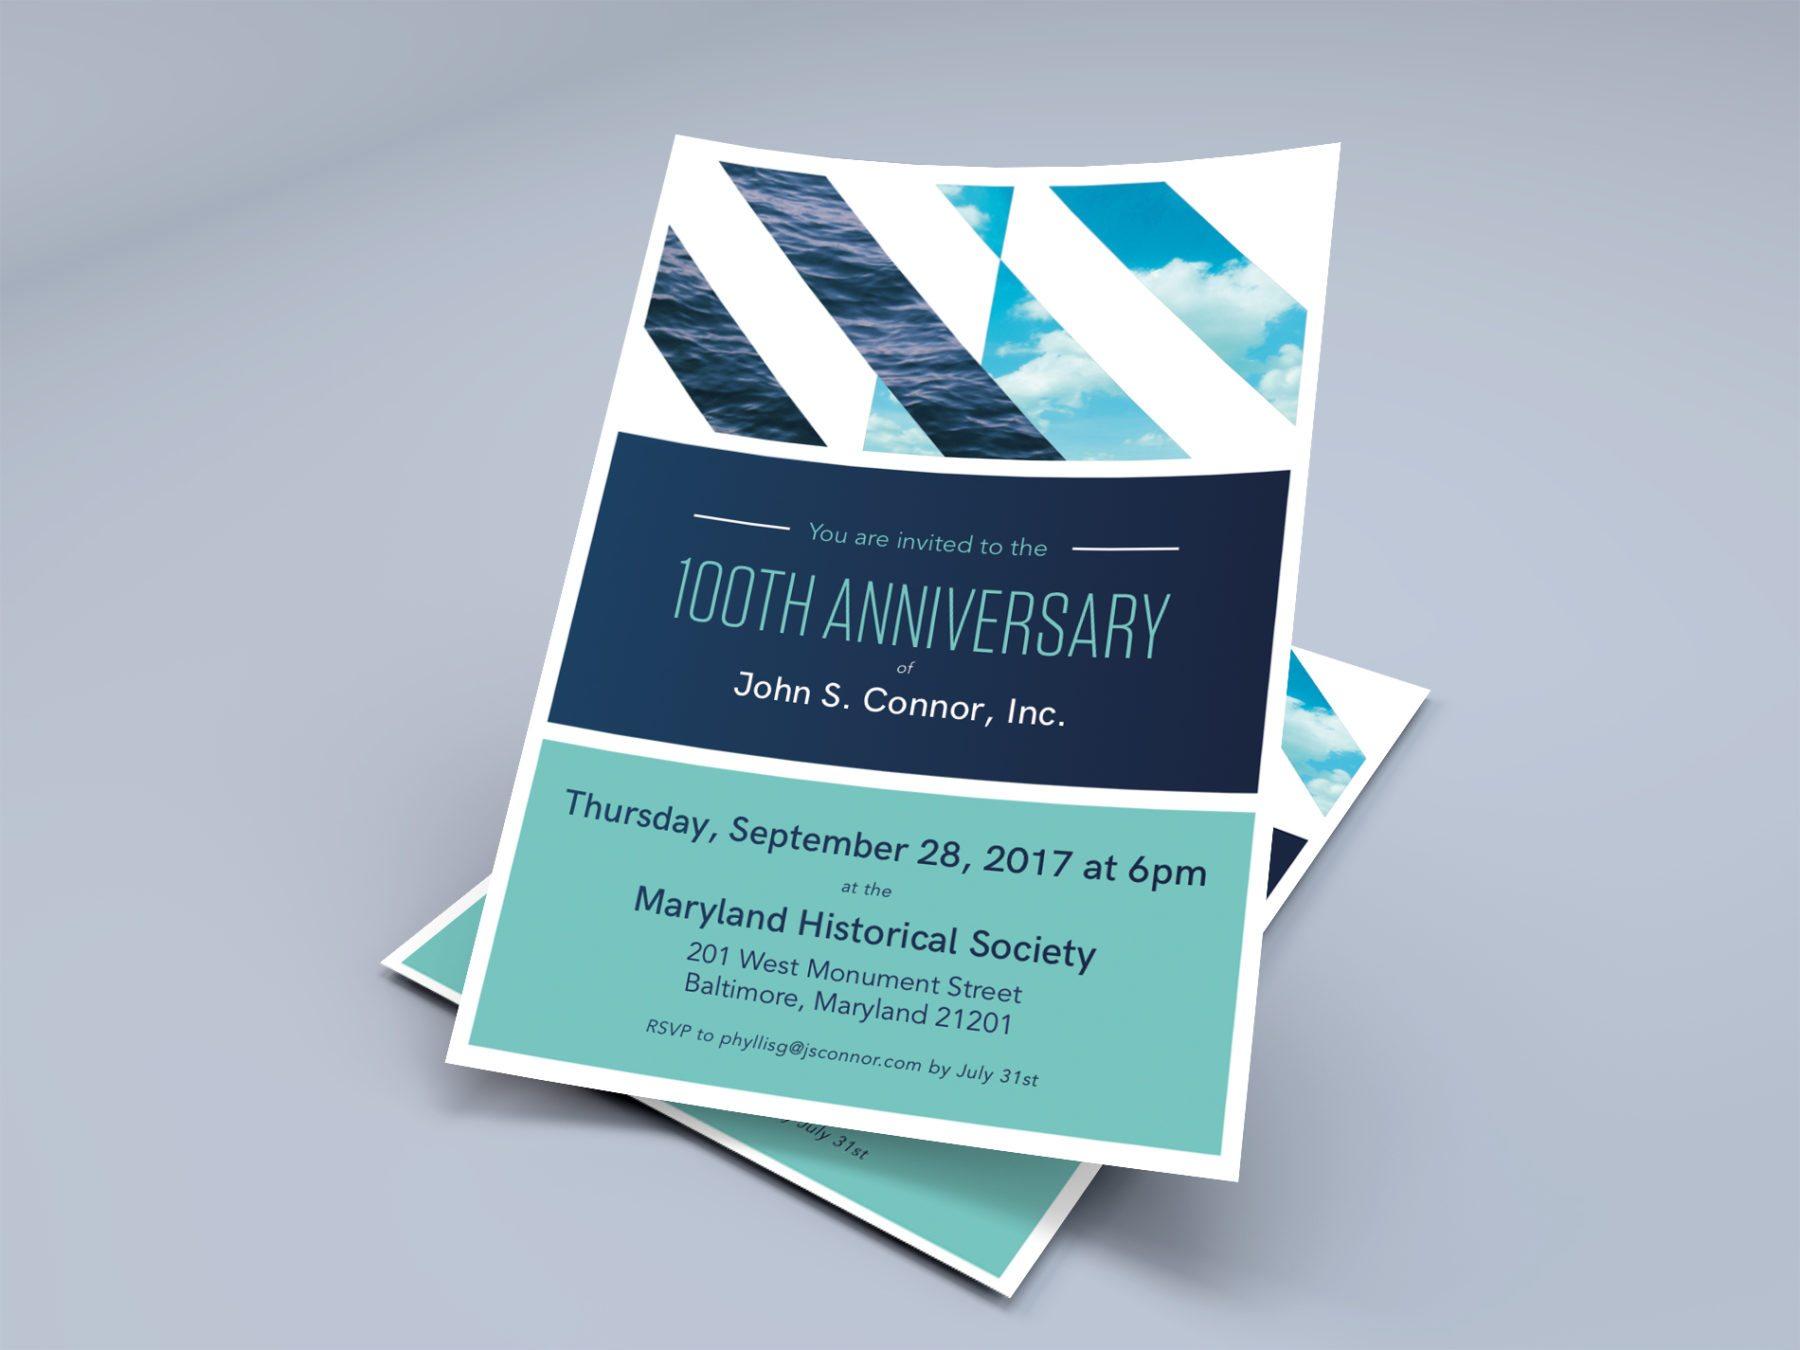 jsc-invite